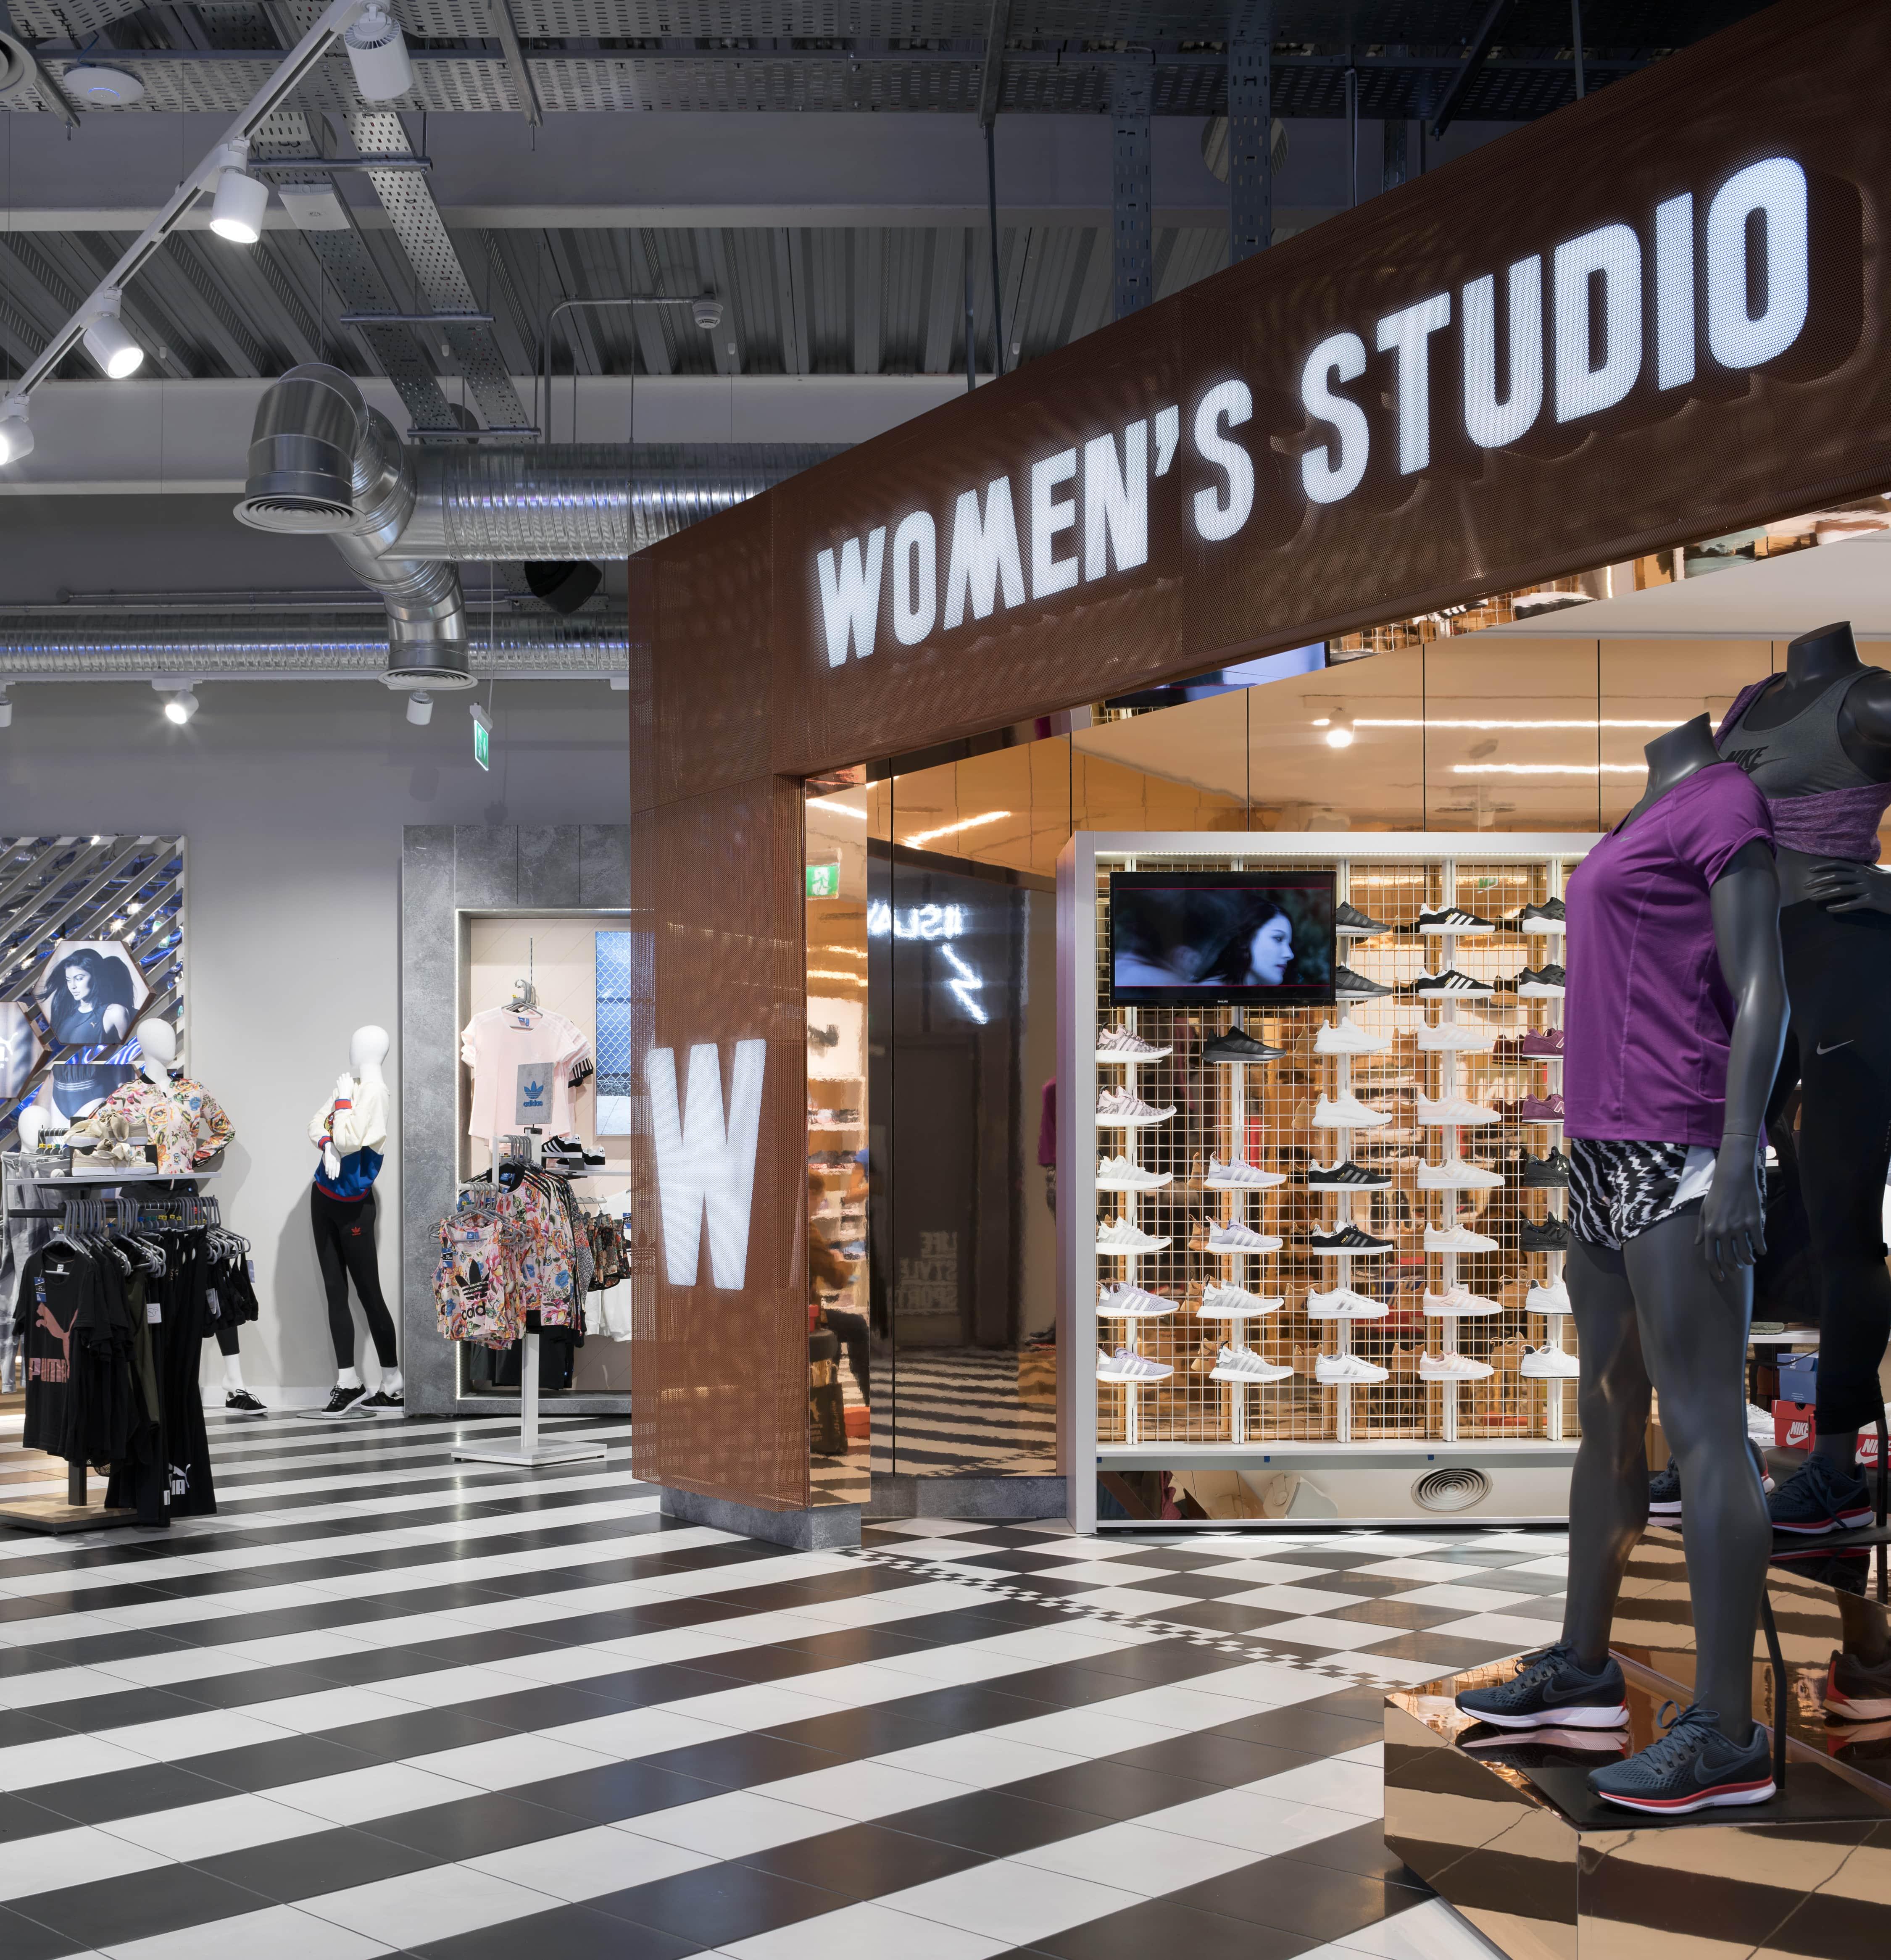 Life Style Sports Capitol Womens Studio